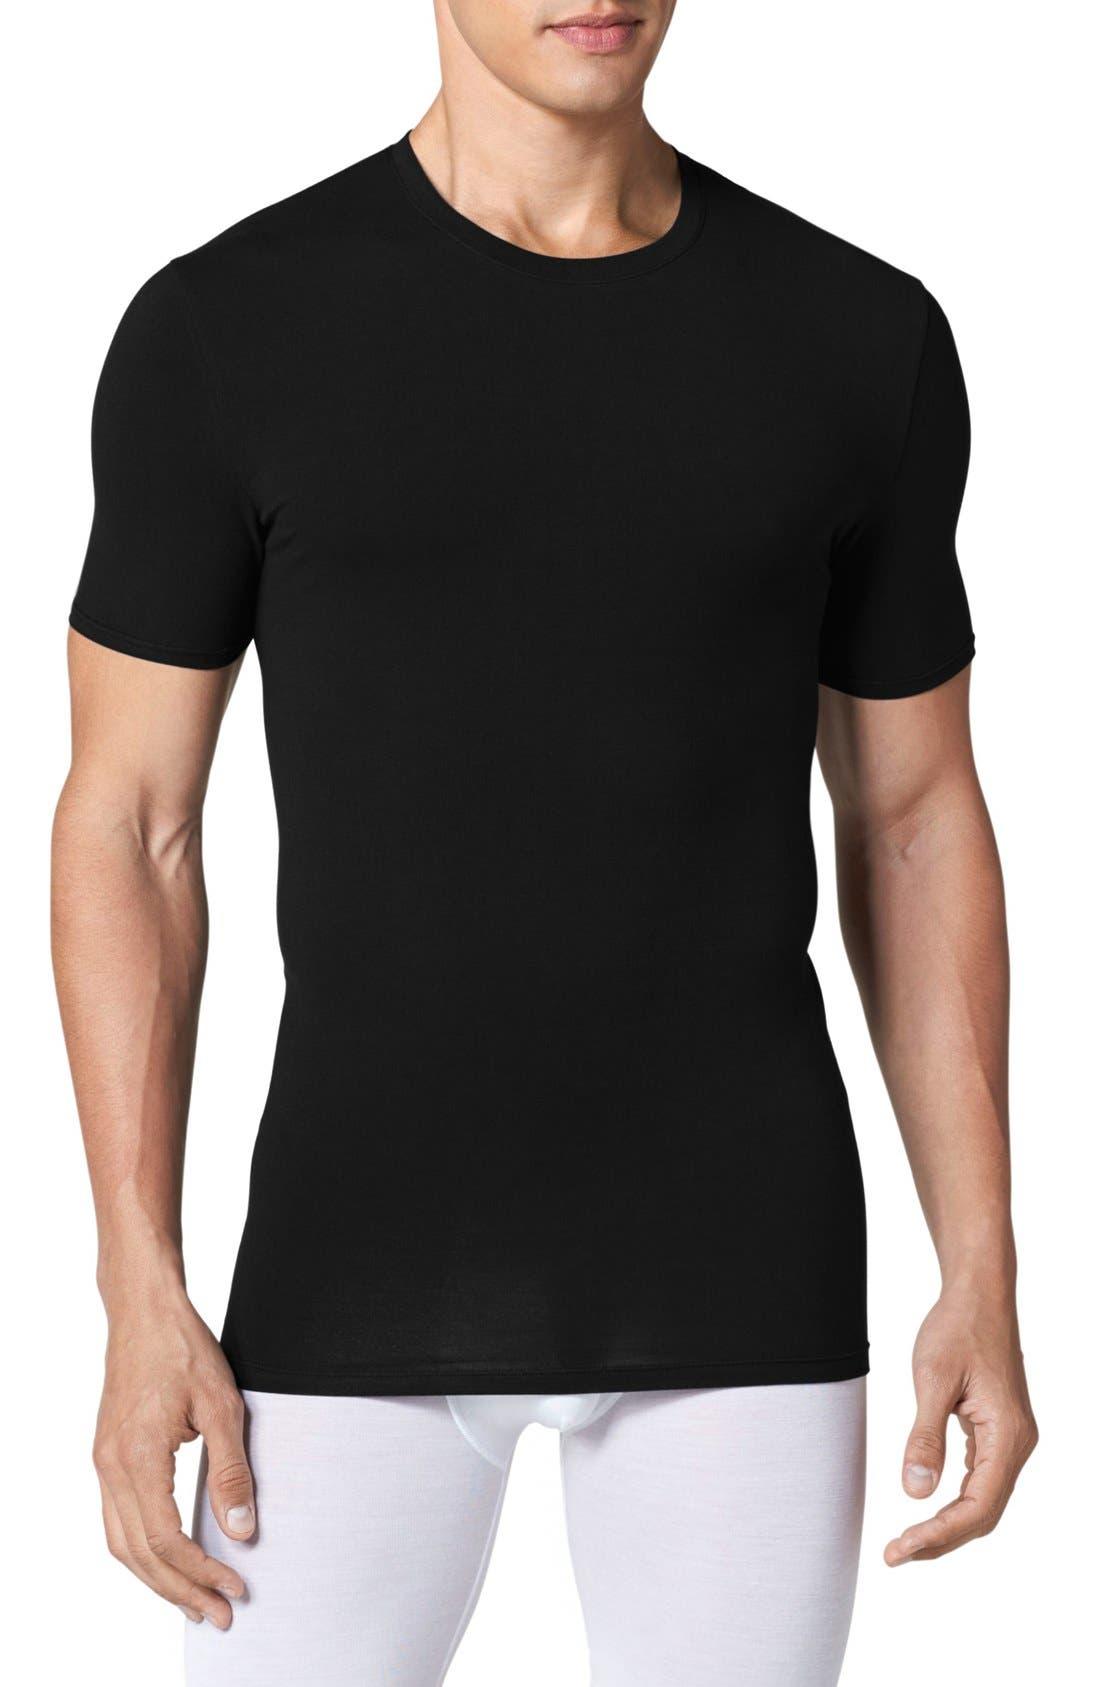 Main Image - Tommy John 'Cool Cotton' Crewneck Undershirt